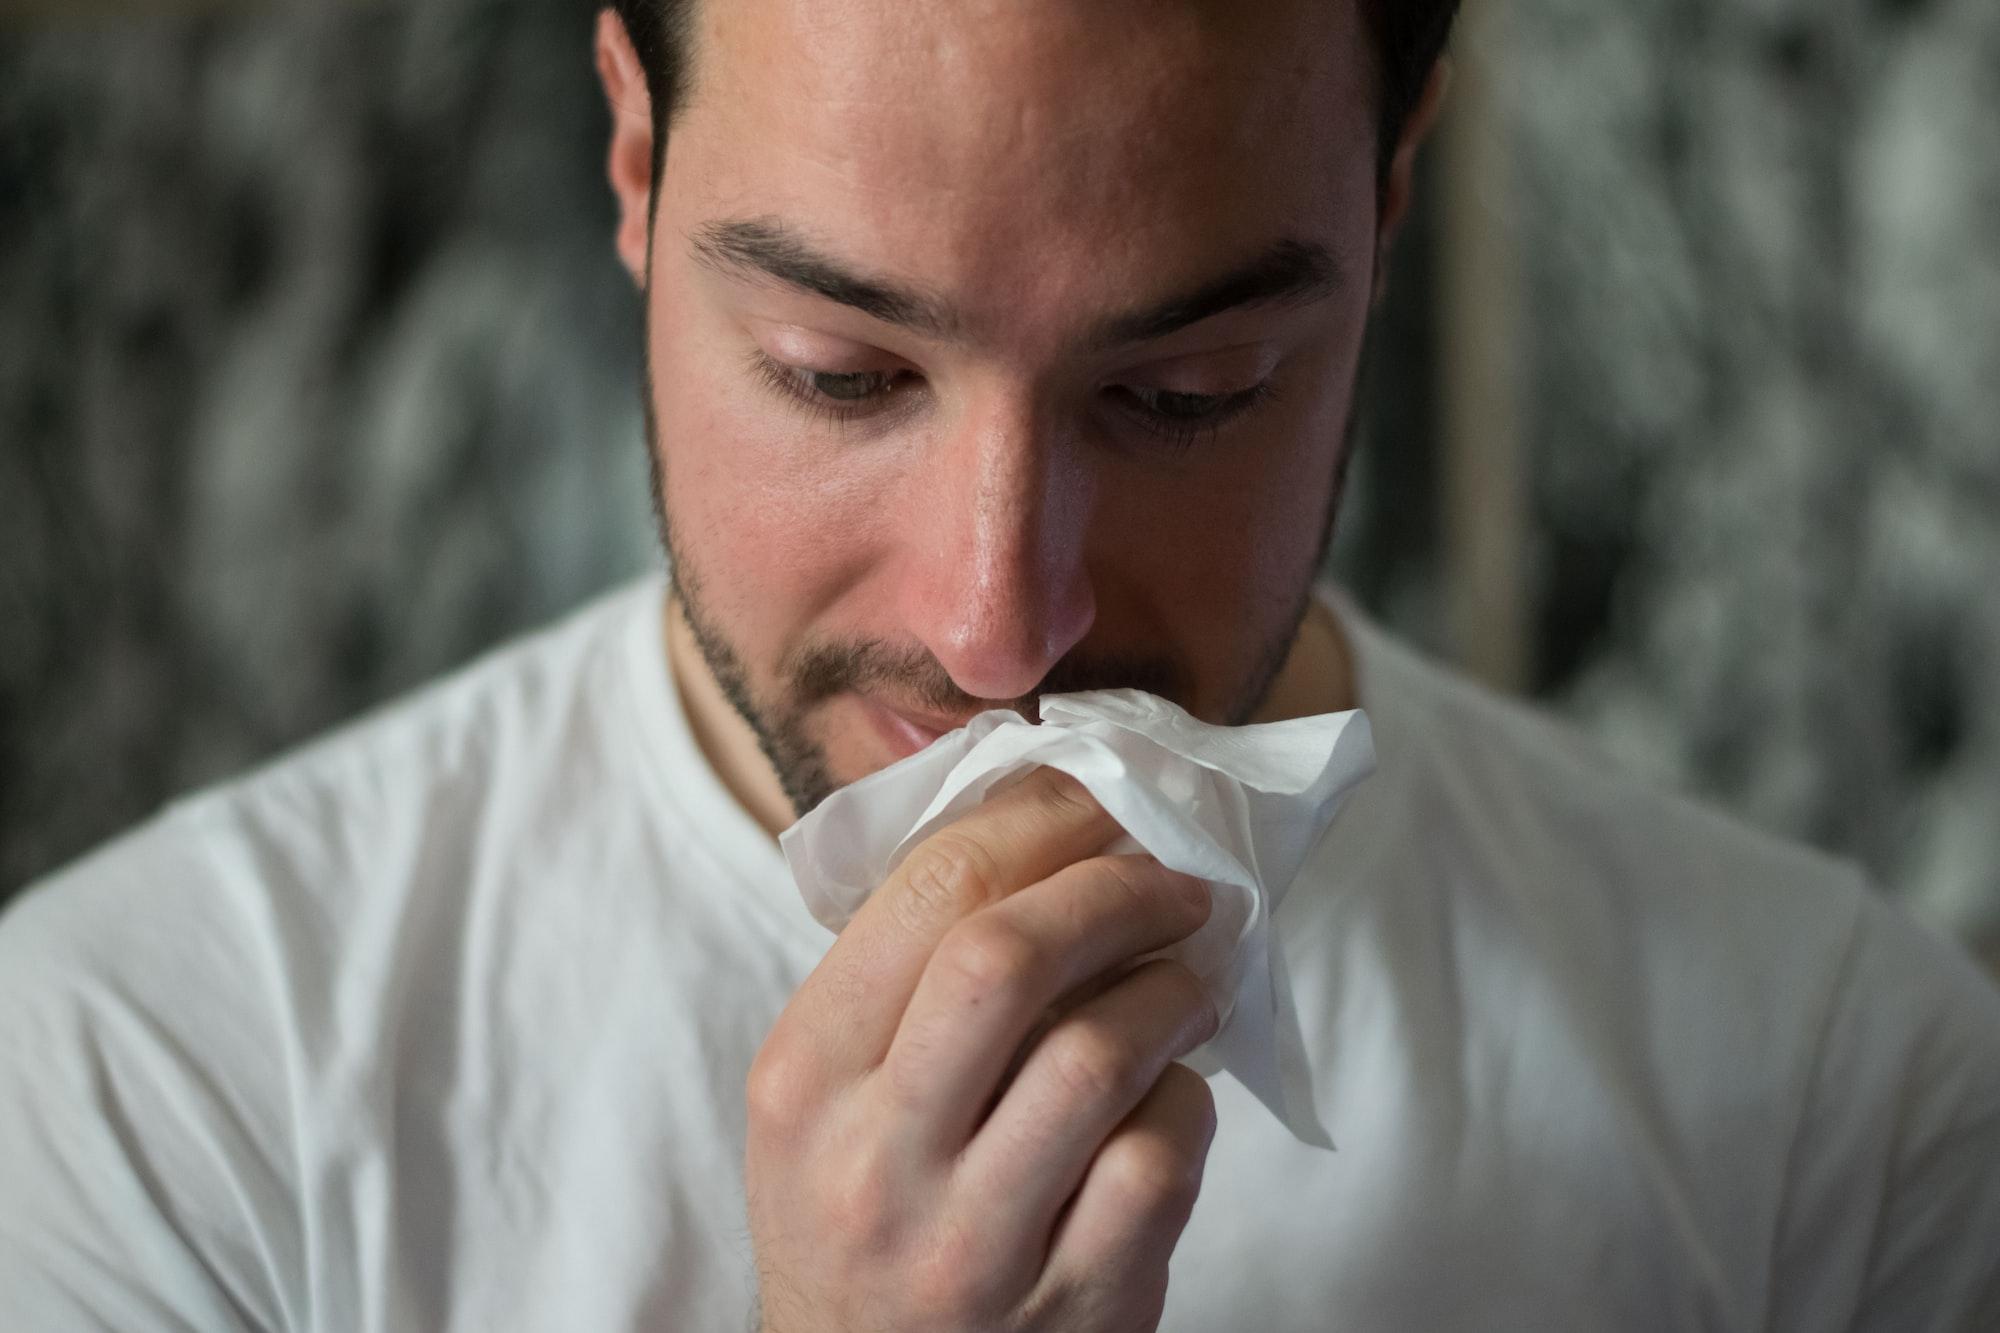 Allergie primaverili e antistaminici